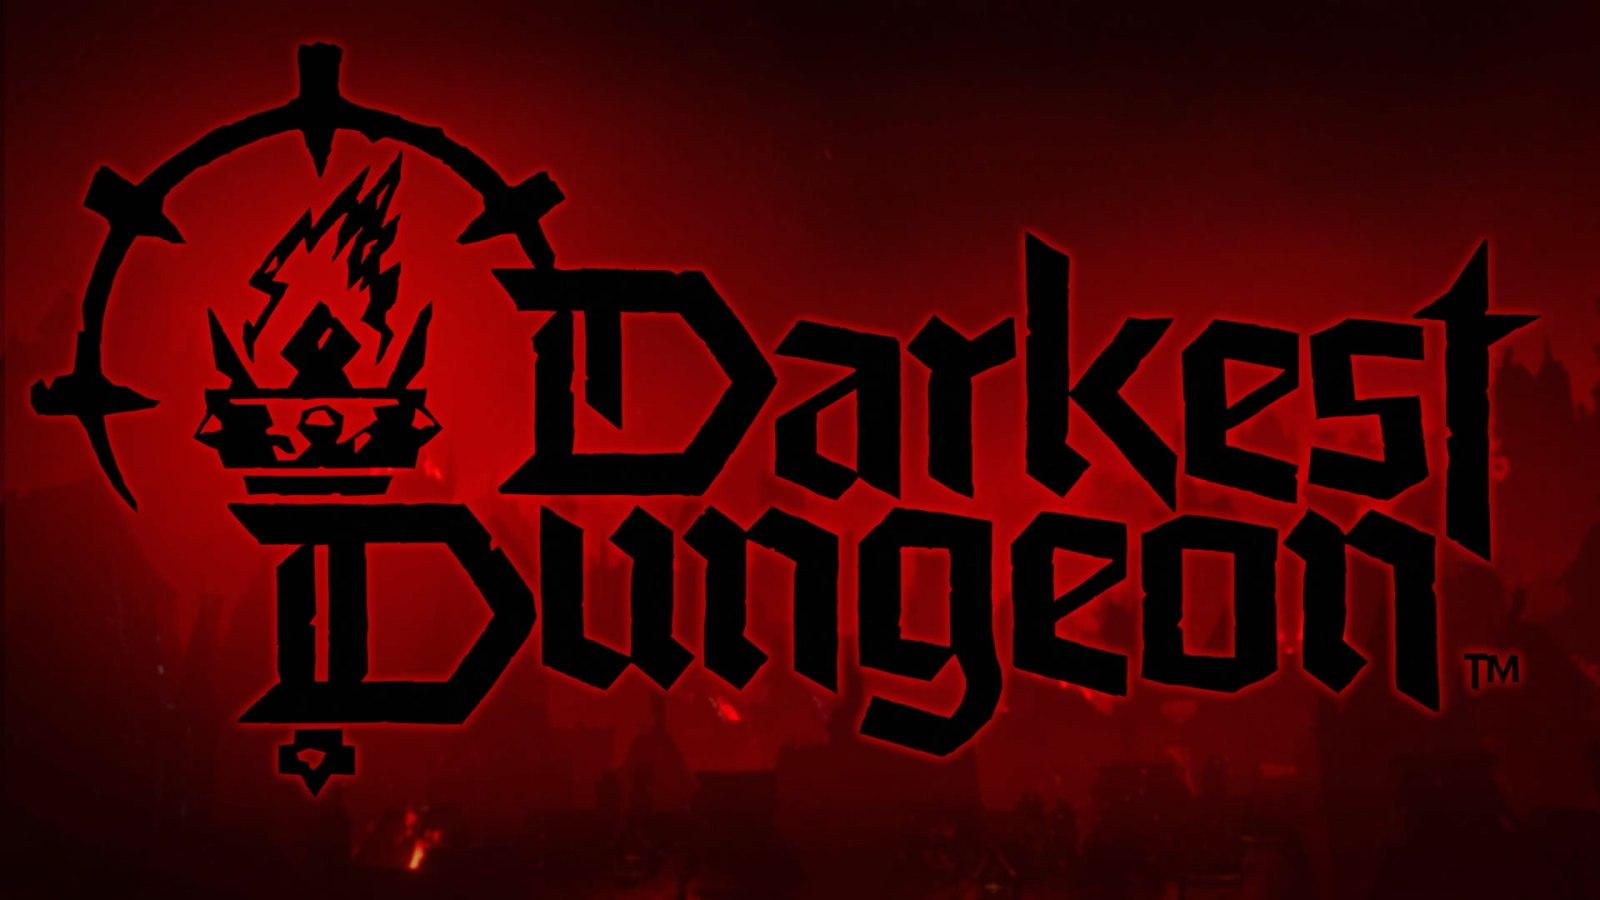 《暗黑地牢 2》将于2021年登录Epic Game Store抢先体验